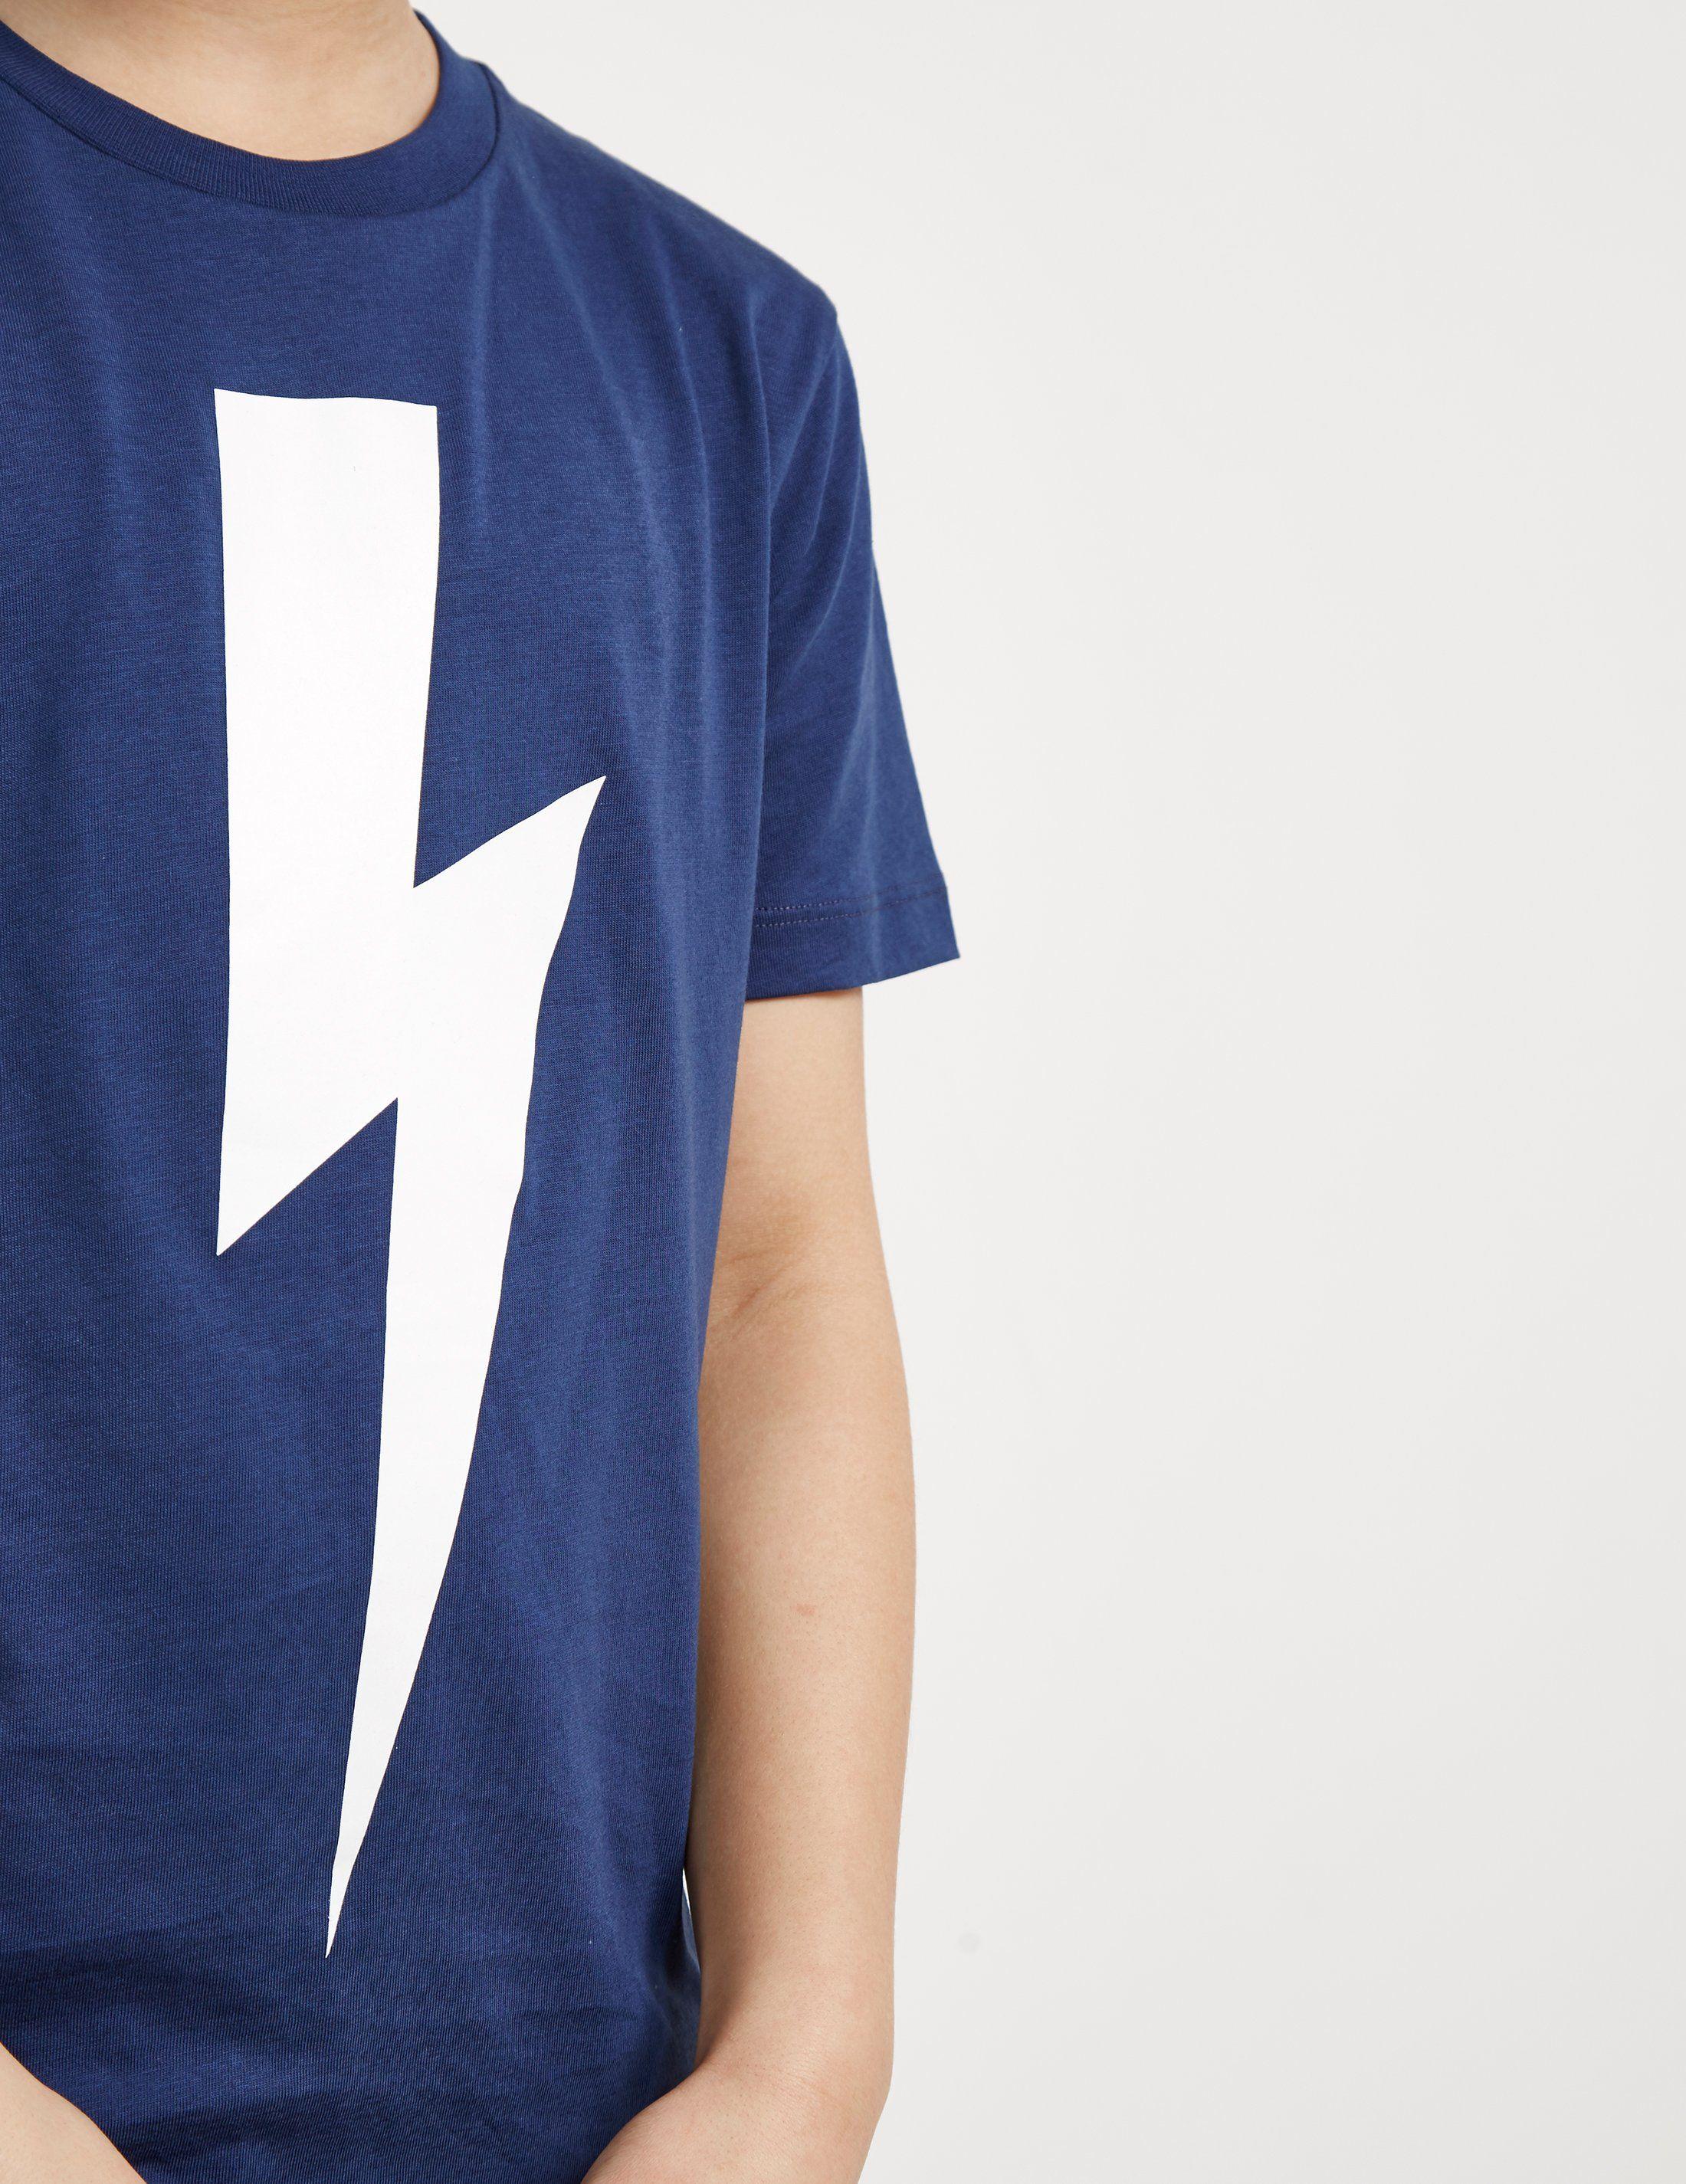 Neil Barrett Large Bolt Logo Short Sleeve T-Shirt